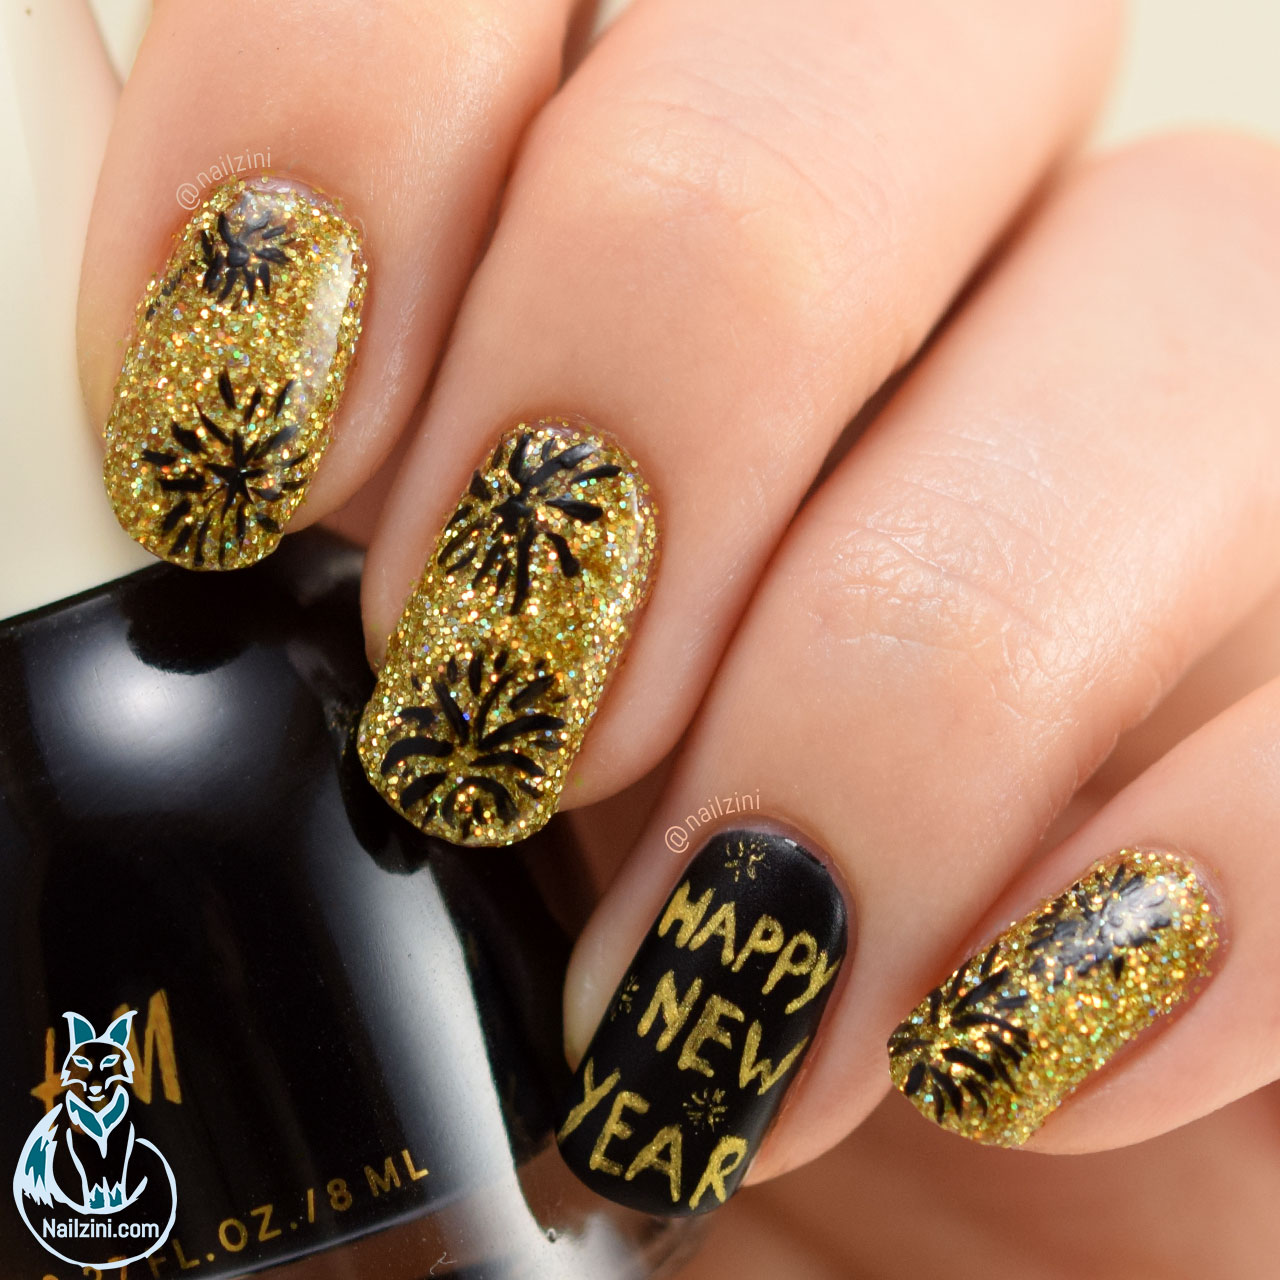 Holographic New Year Fireworks Nail Art Nailzini